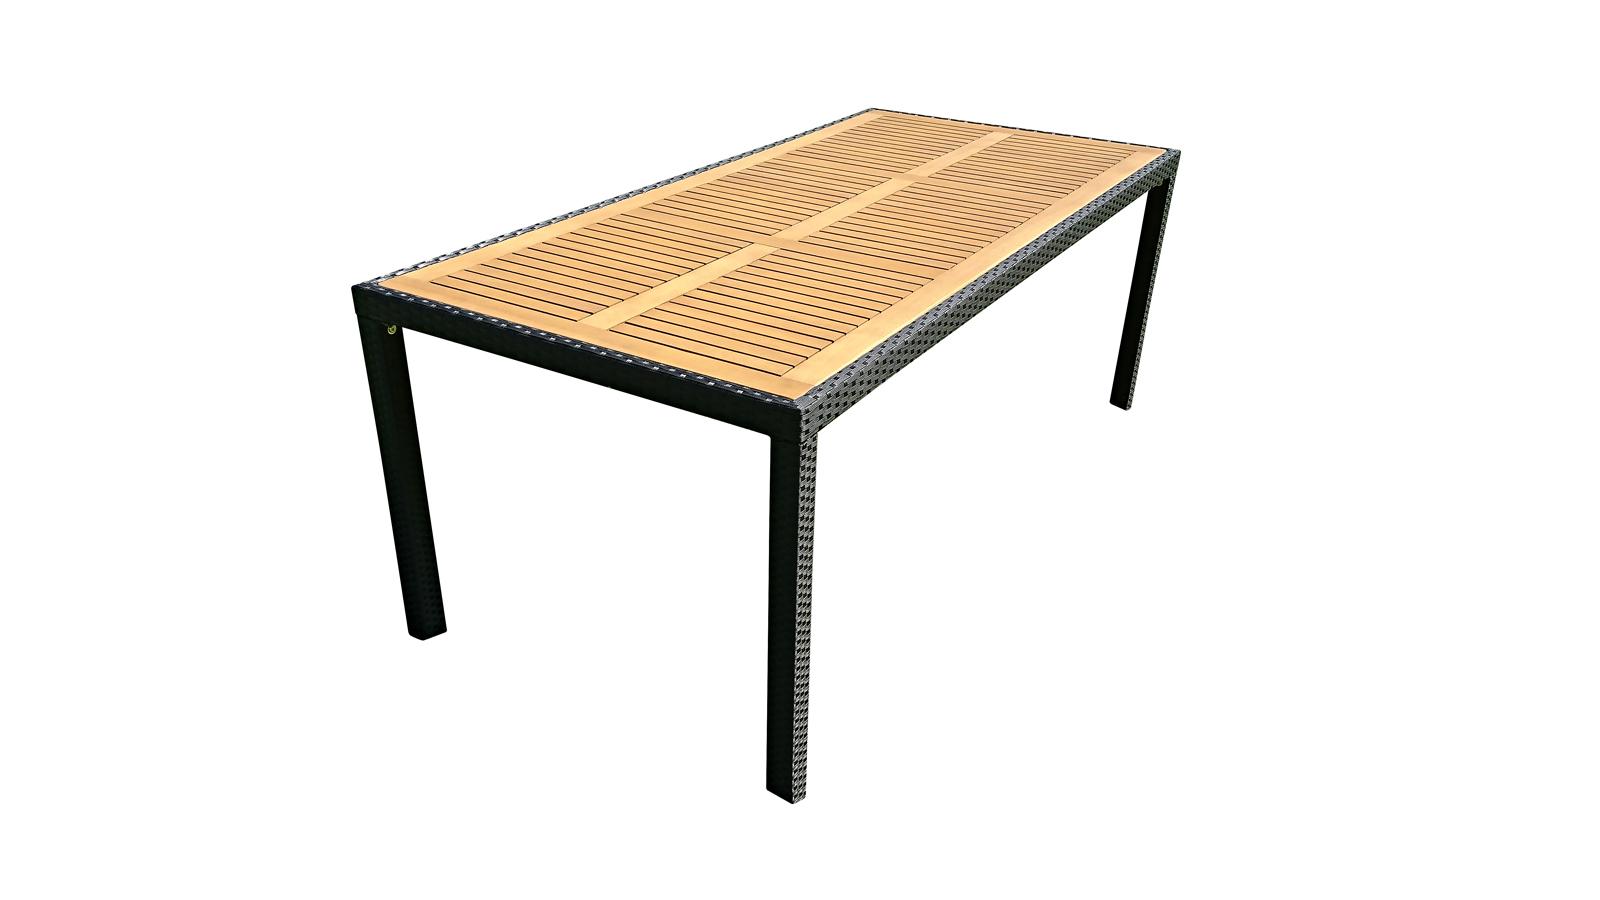 sam gartentisch polyrattan 190 cm aluminium gestell finn. Black Bedroom Furniture Sets. Home Design Ideas